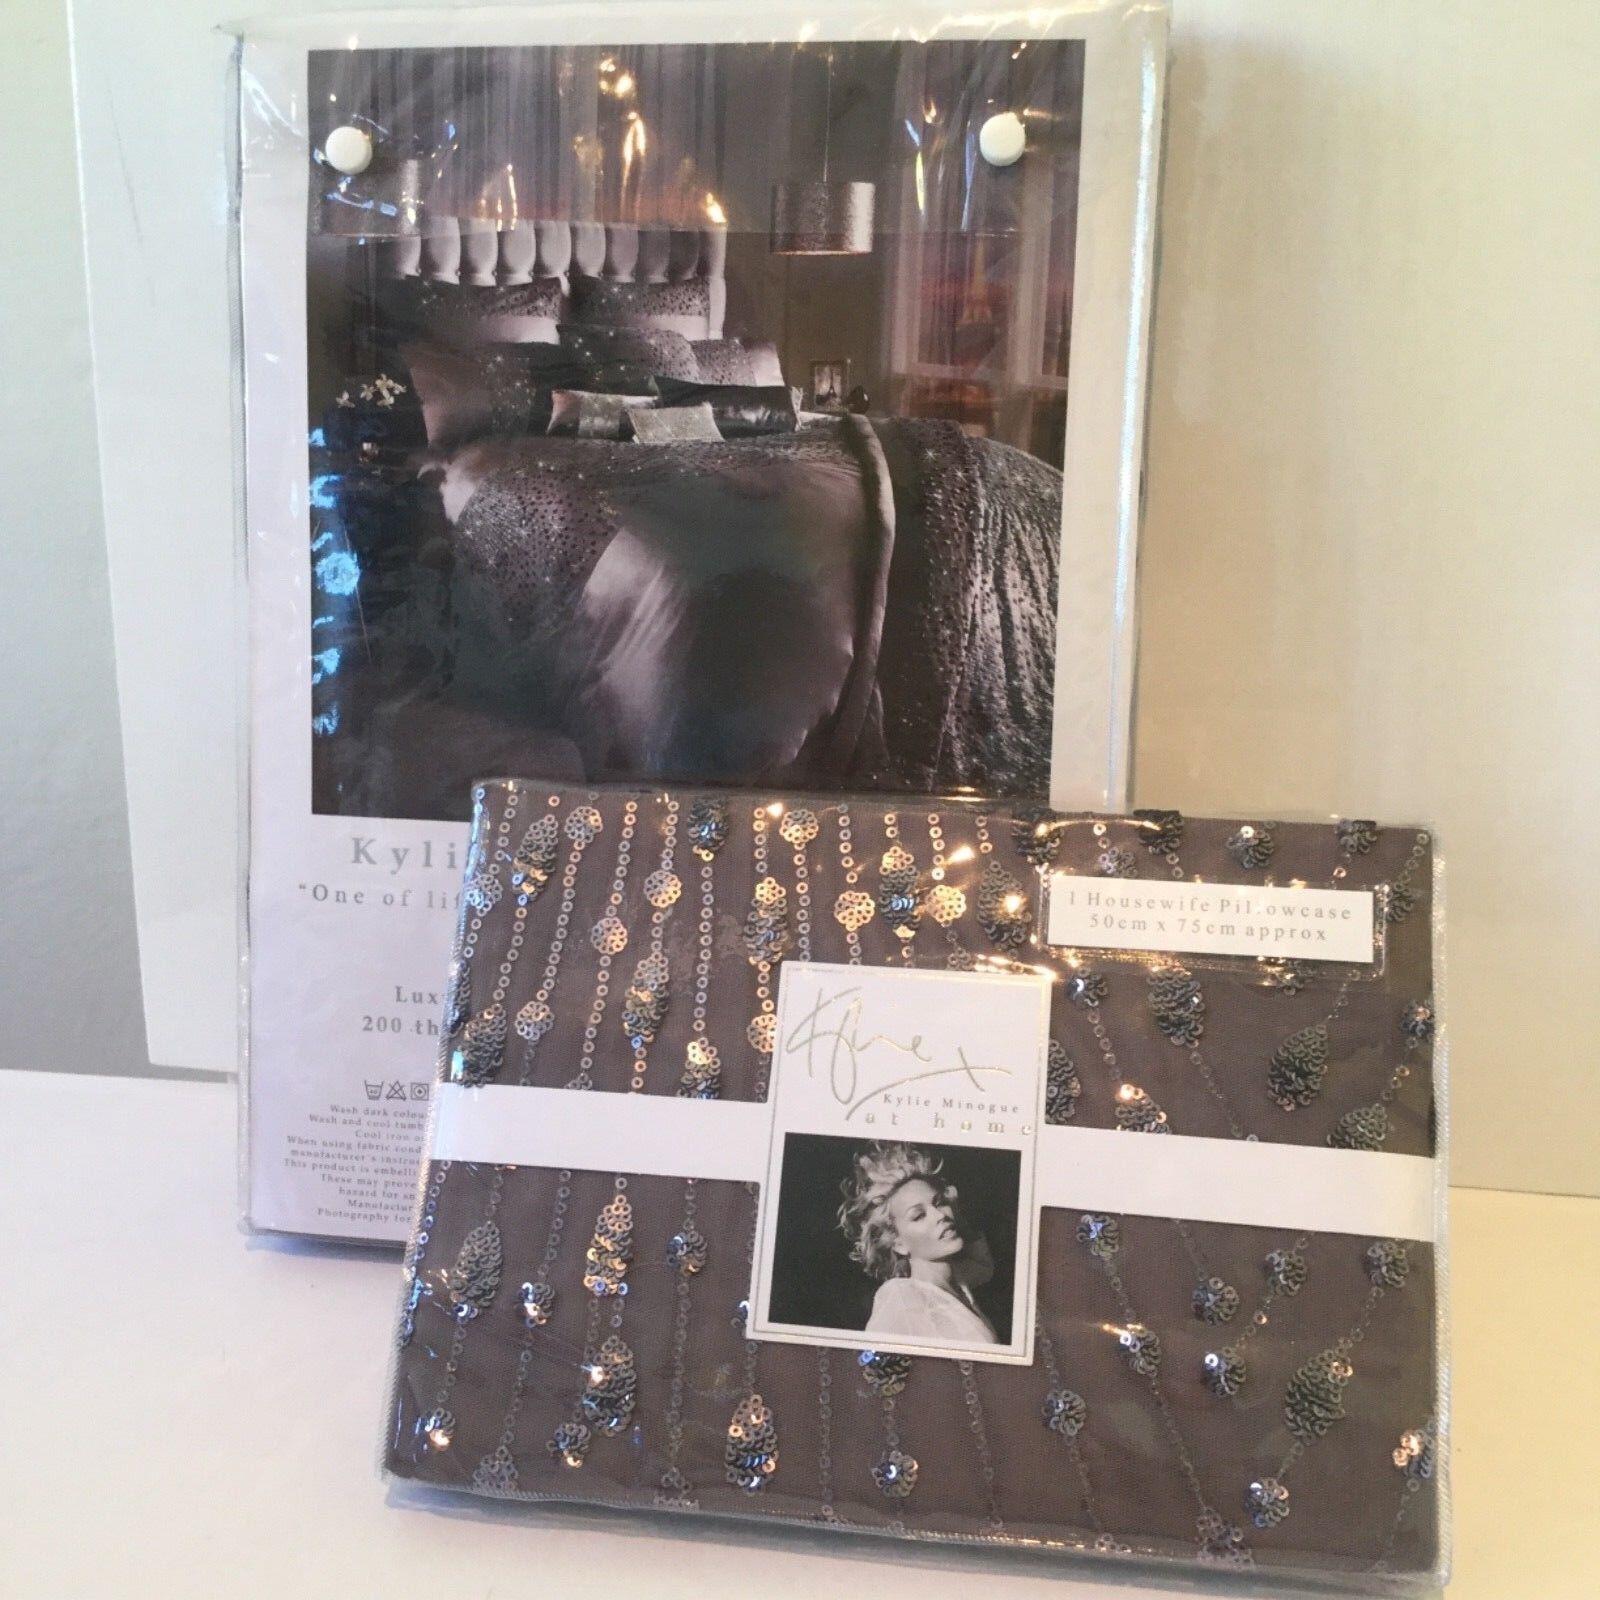 Kylie Minogue Eva Mauve single Größe Bedding Set Duvet Pillows Quilt